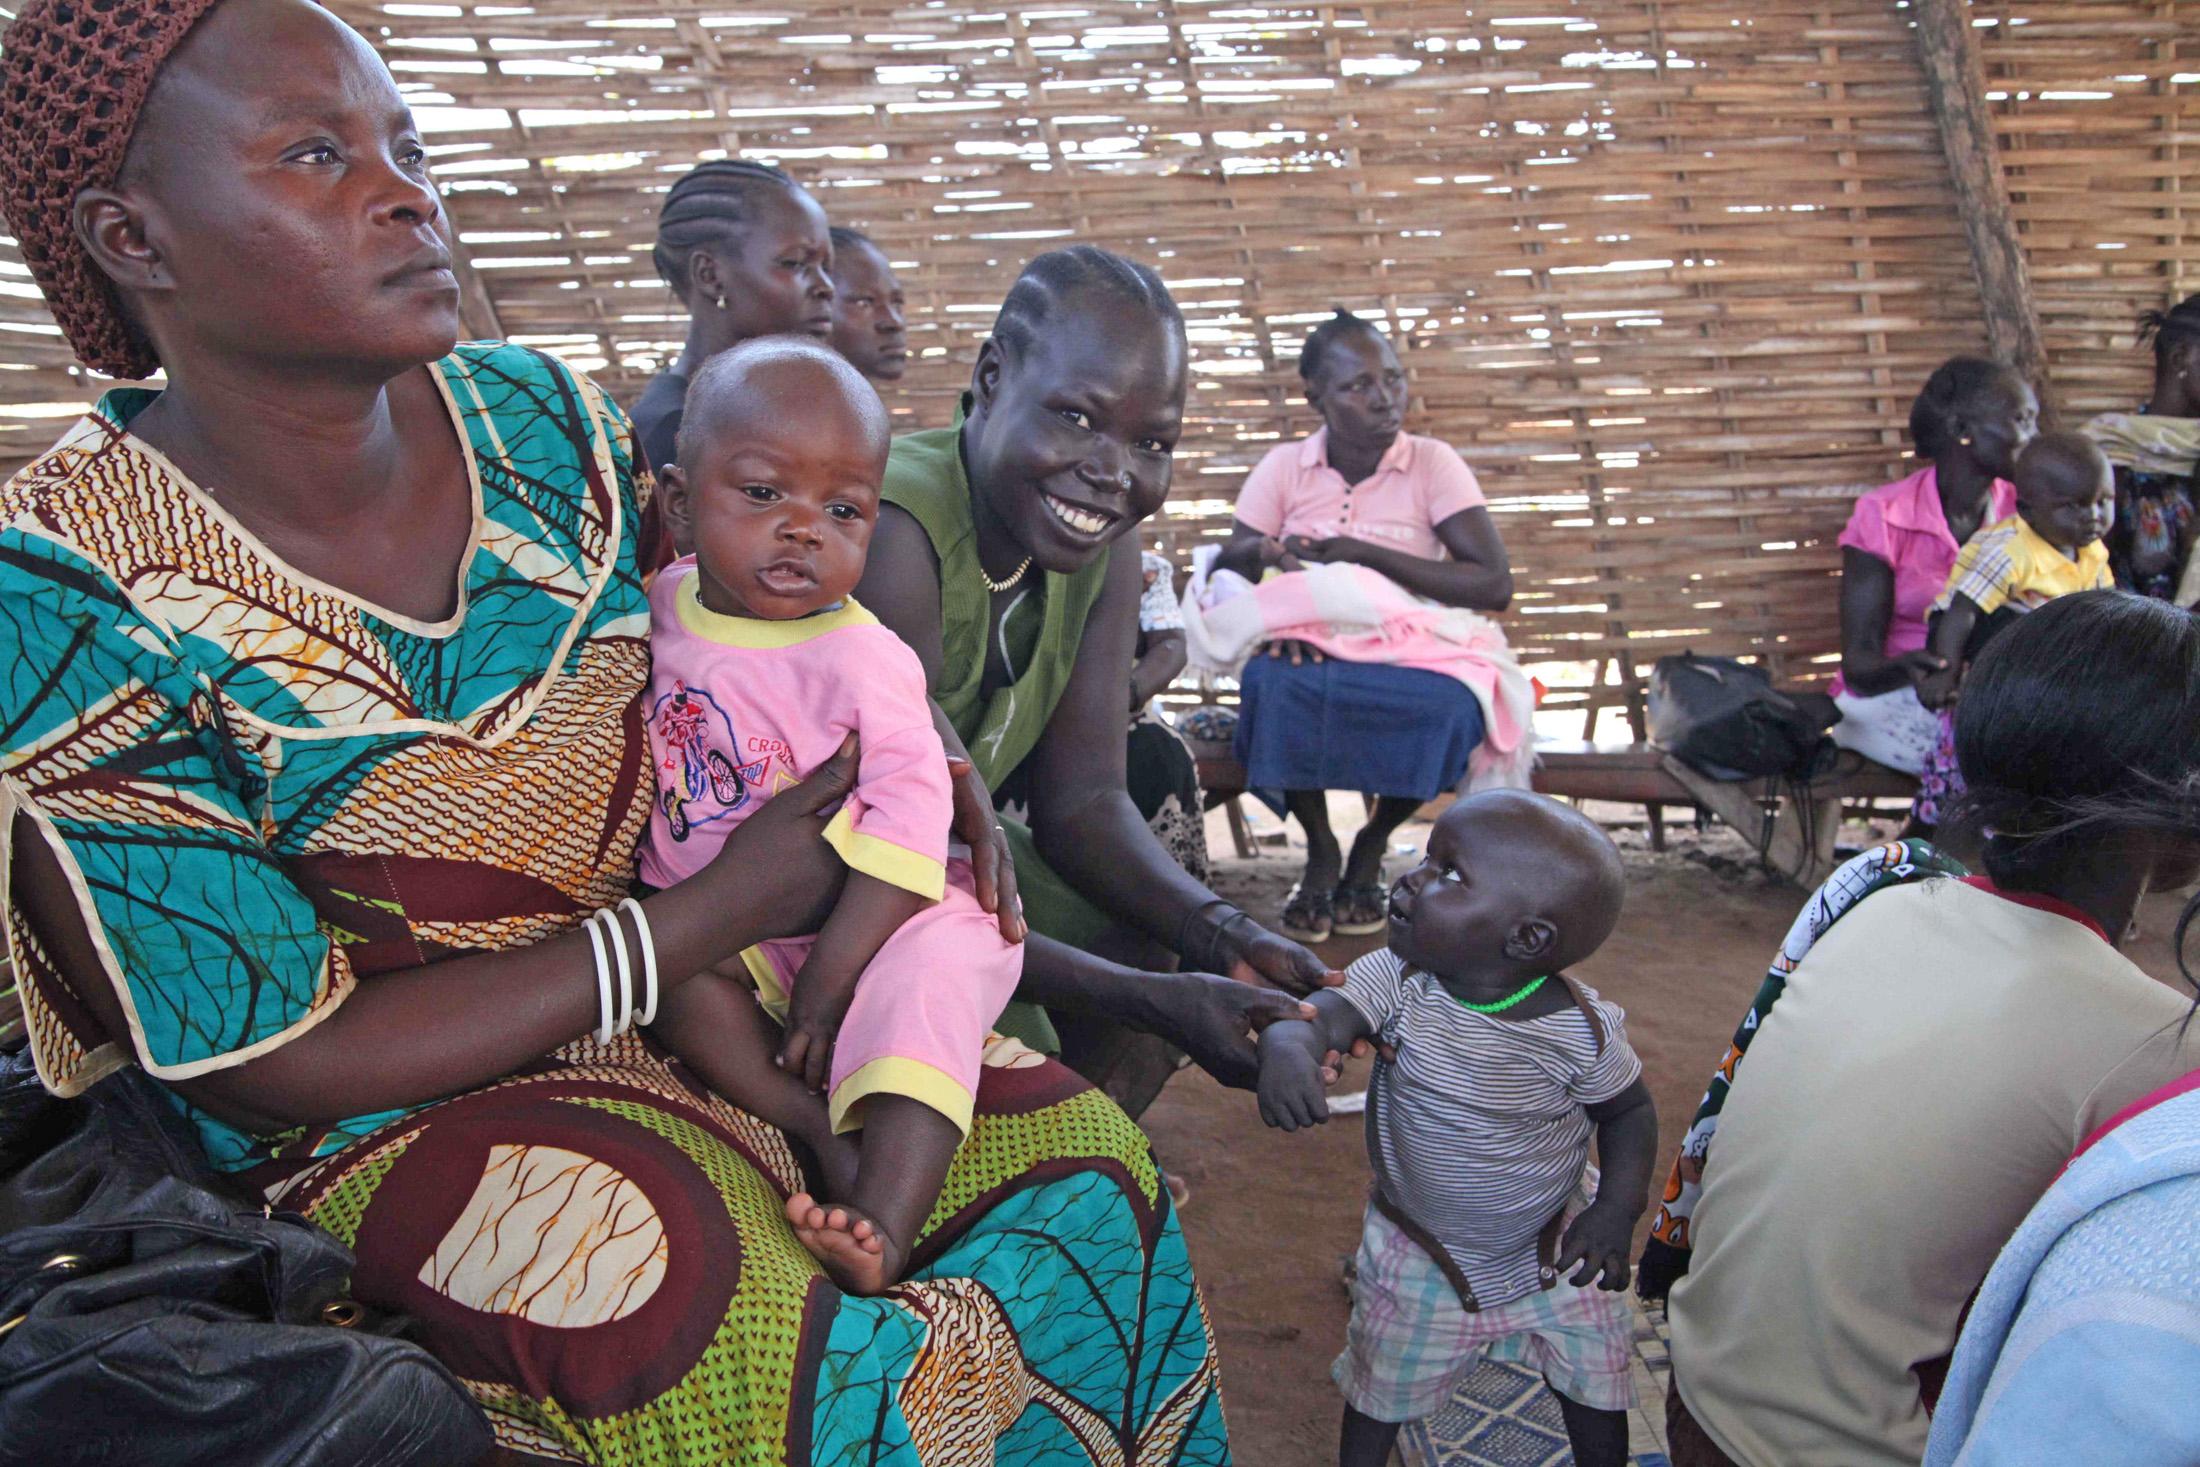 irin sexual violence soars in south sudan